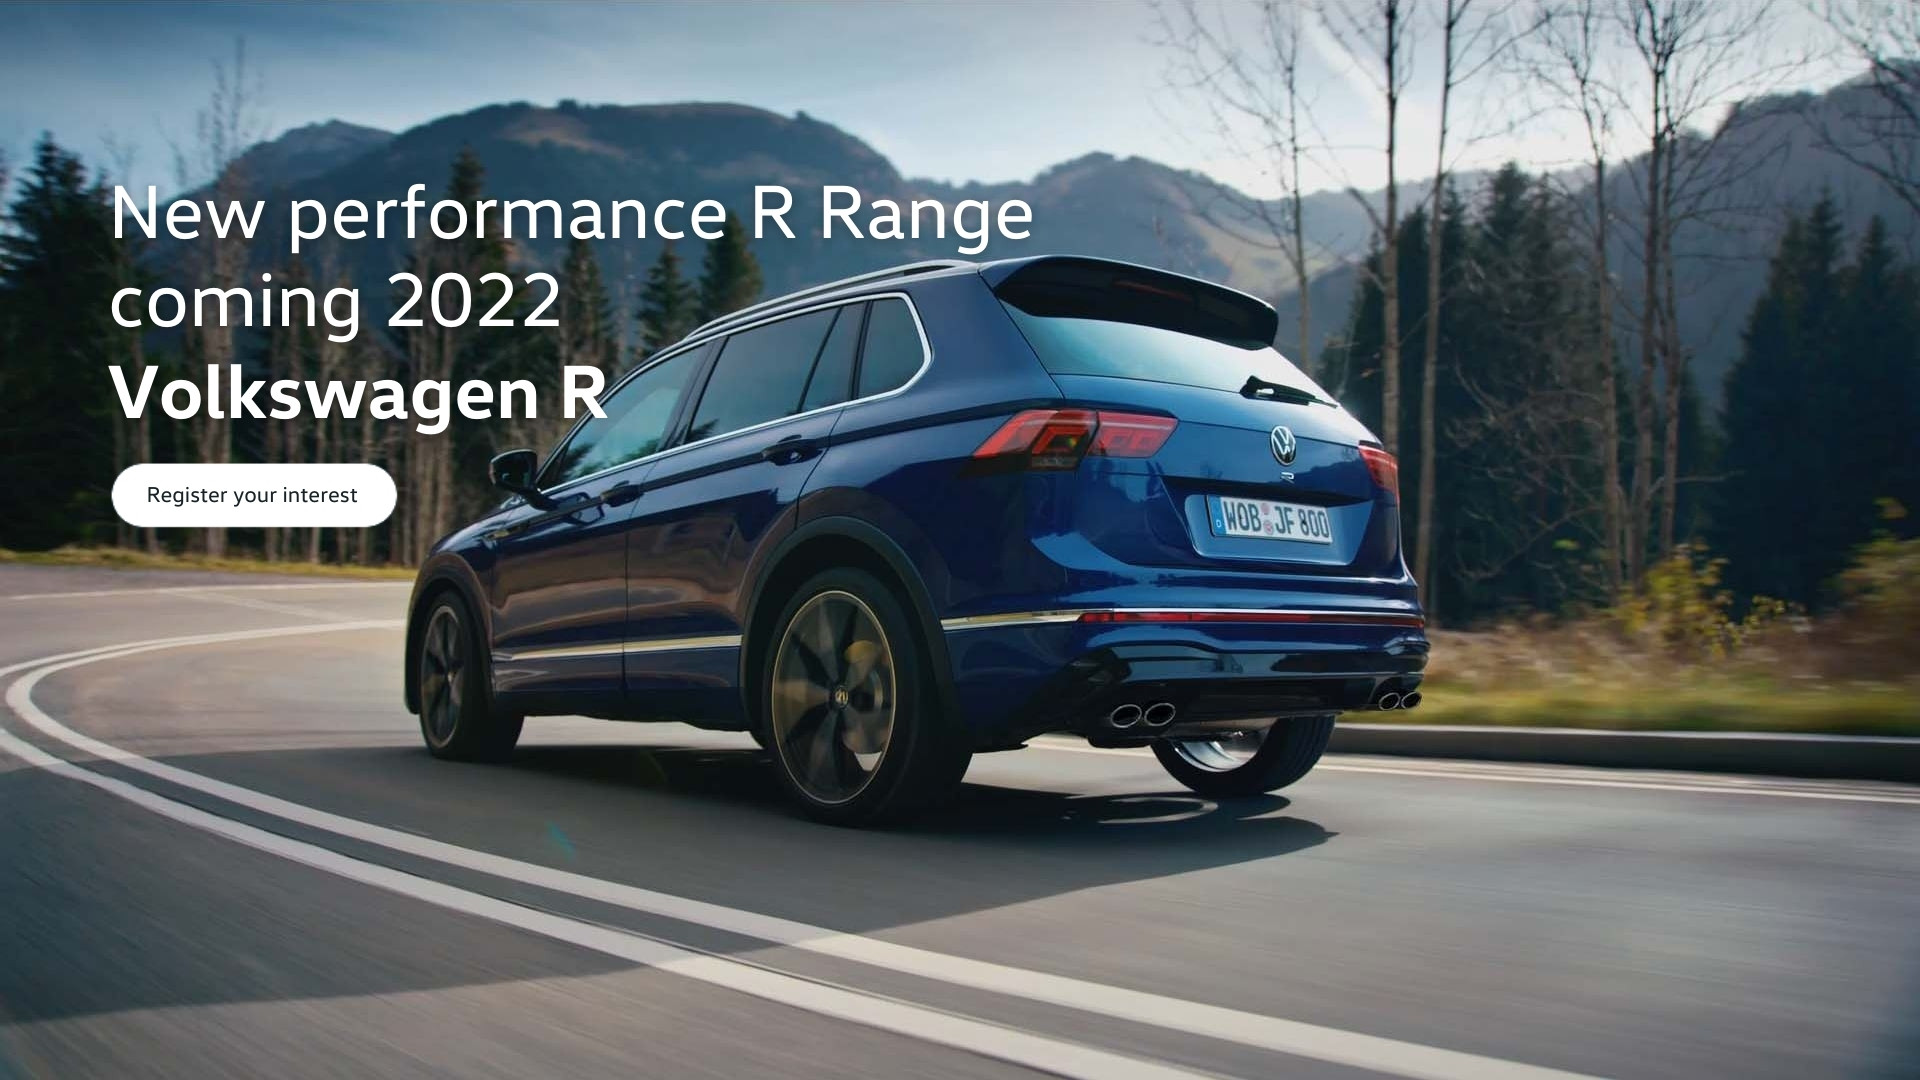 New performance R Range coming 2022